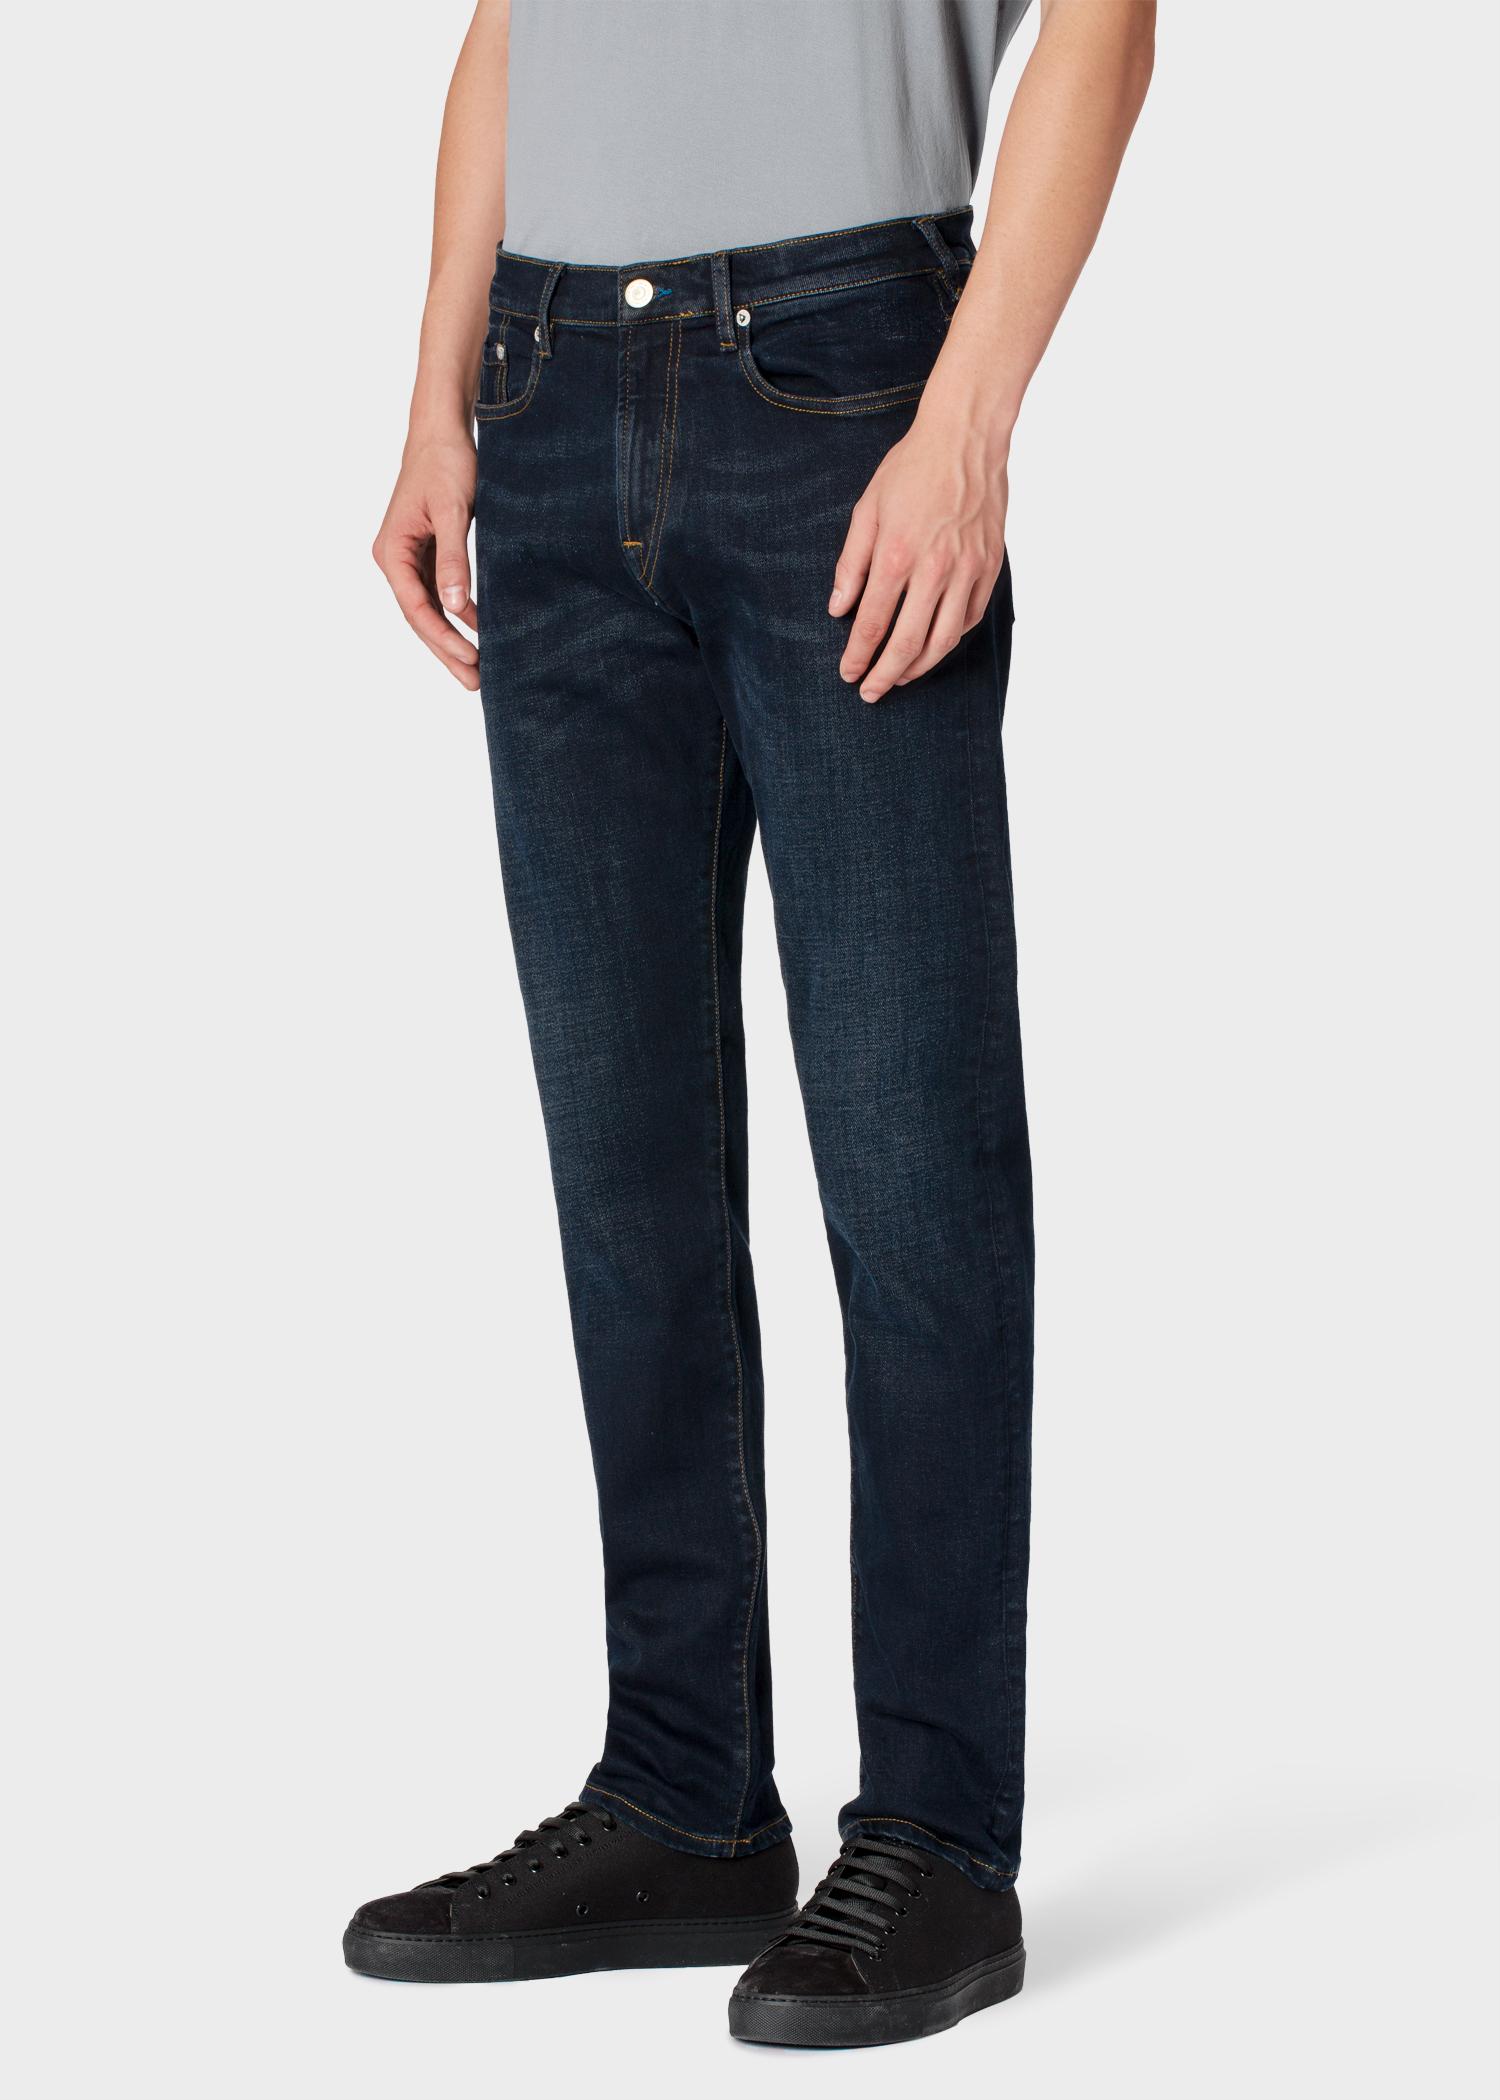 Top Men's Tapered-Fit Dark-Wash 'Blue/Black Reflex' Denim Jeans - Paul EX21